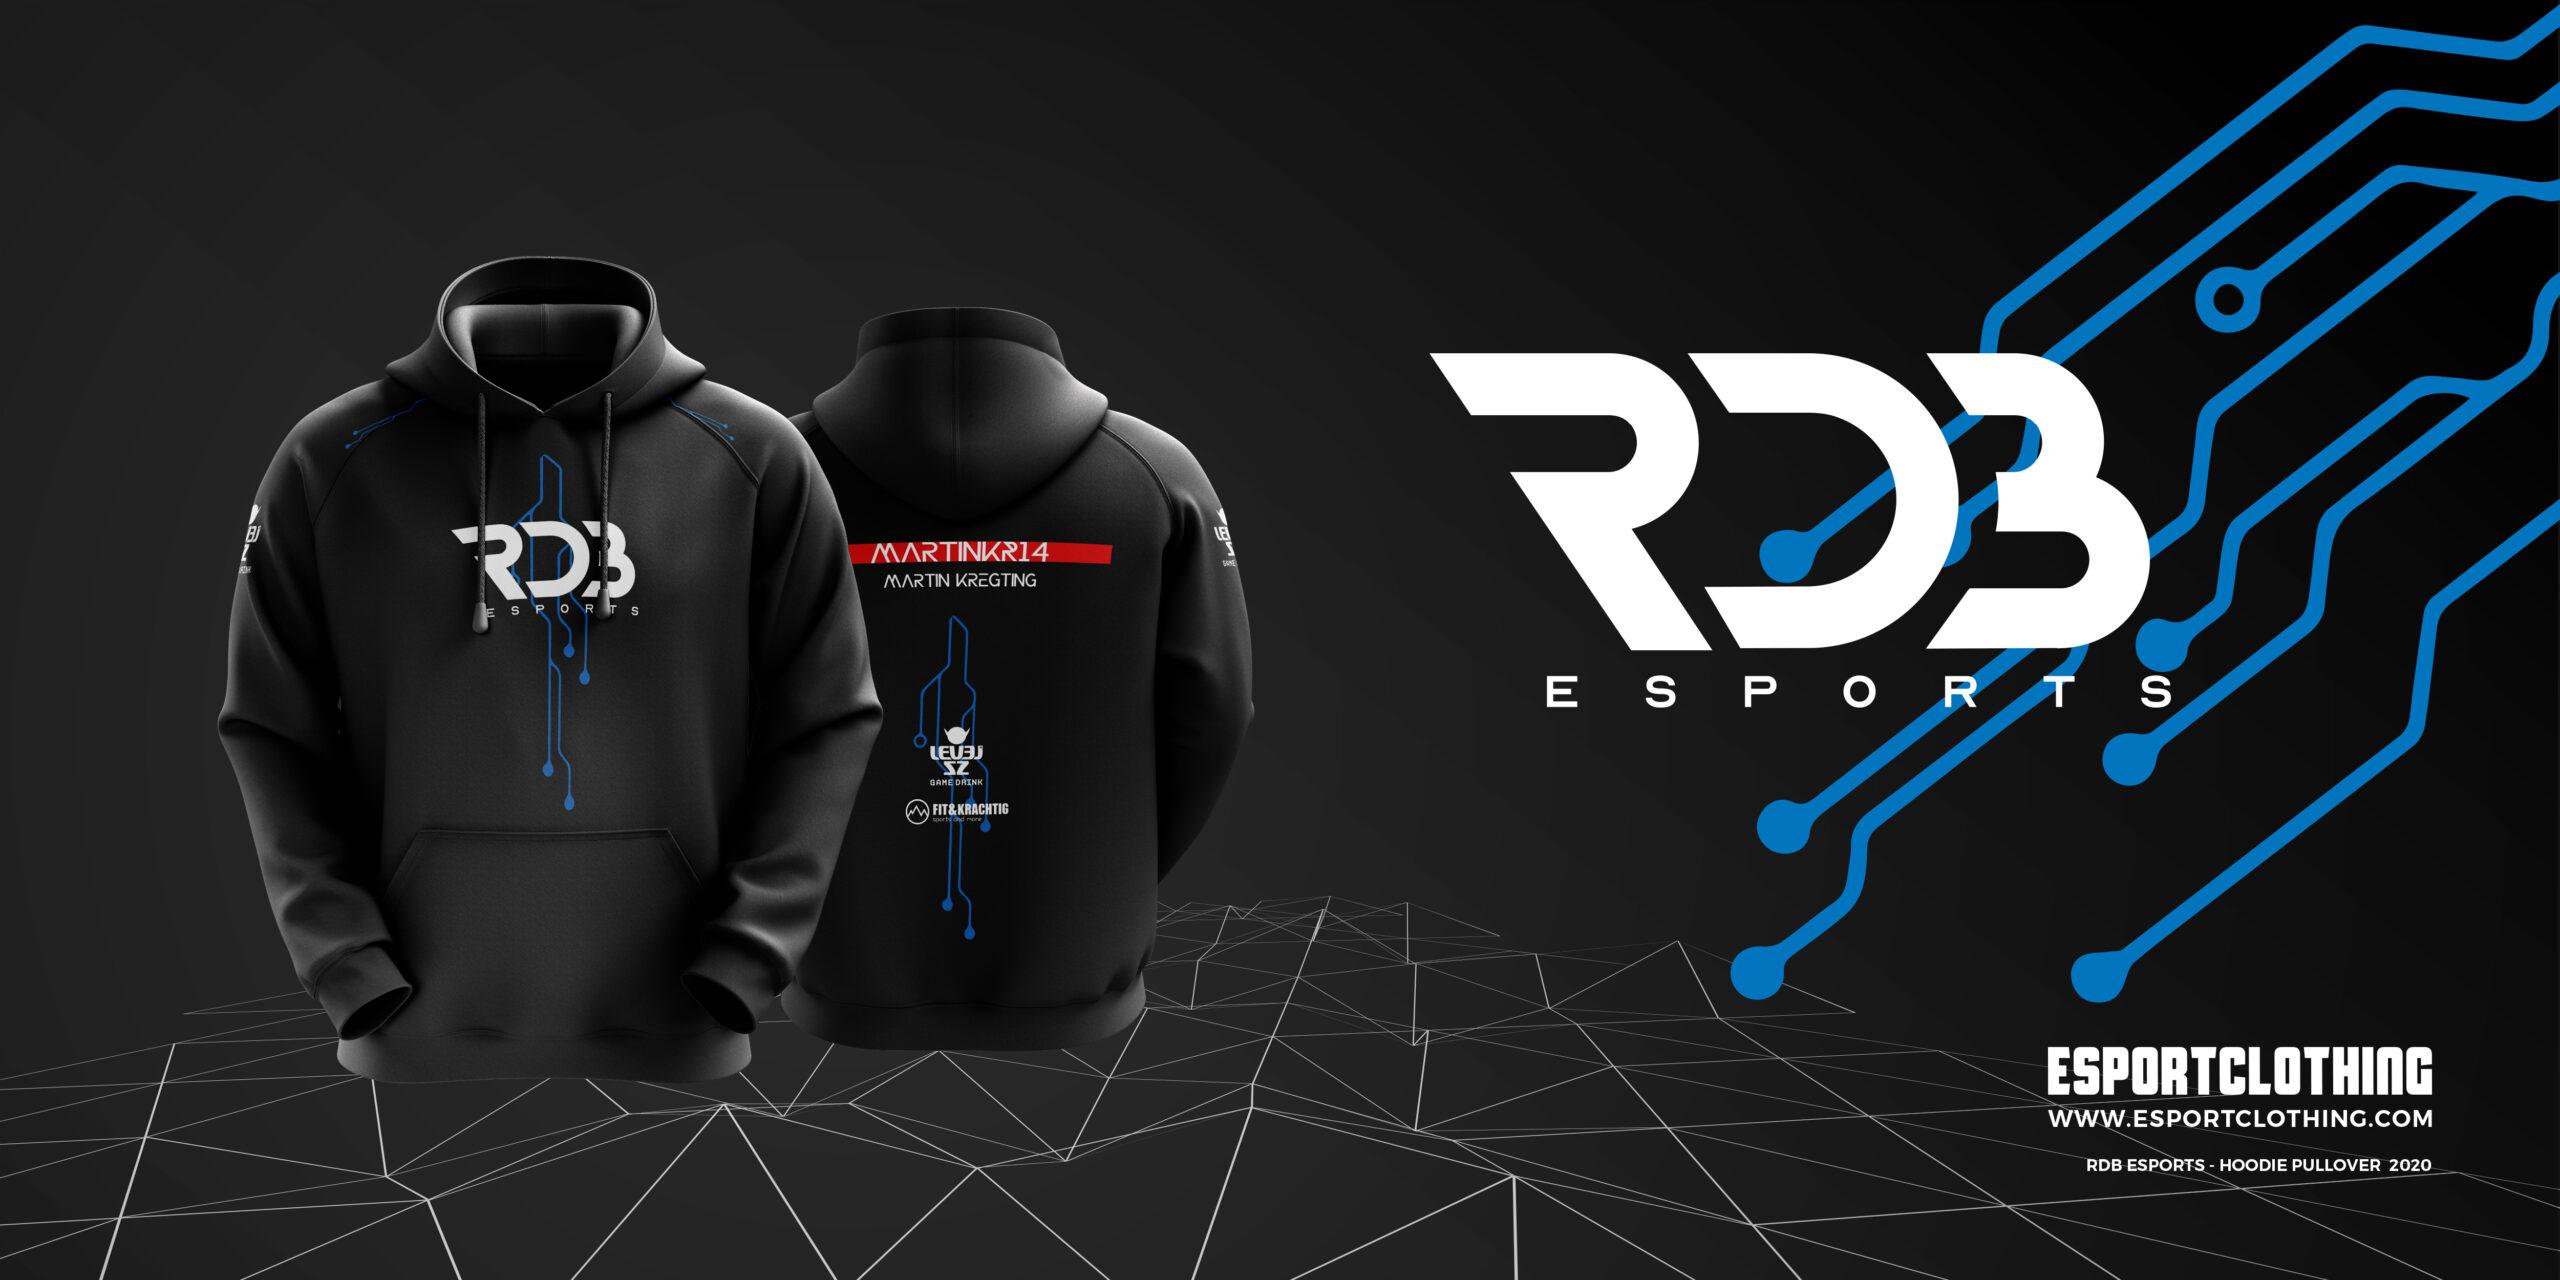 Athlete Gaming Hoodie Pullover 3D RDB Esports